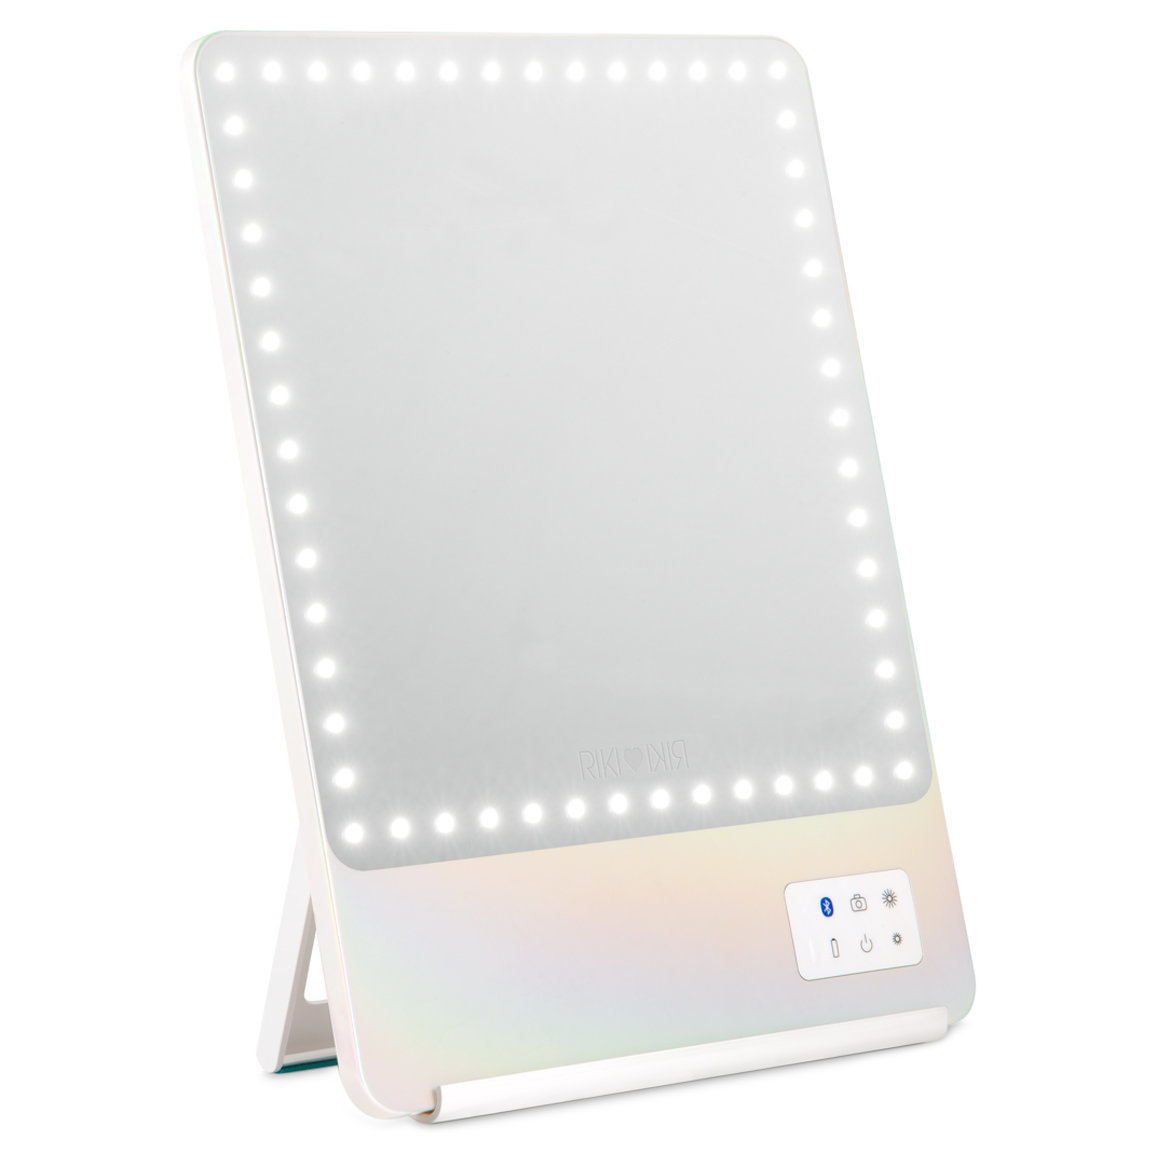 Glamcor Iridescent Riki Skinny Mirror alternative view 1 - product swatch.